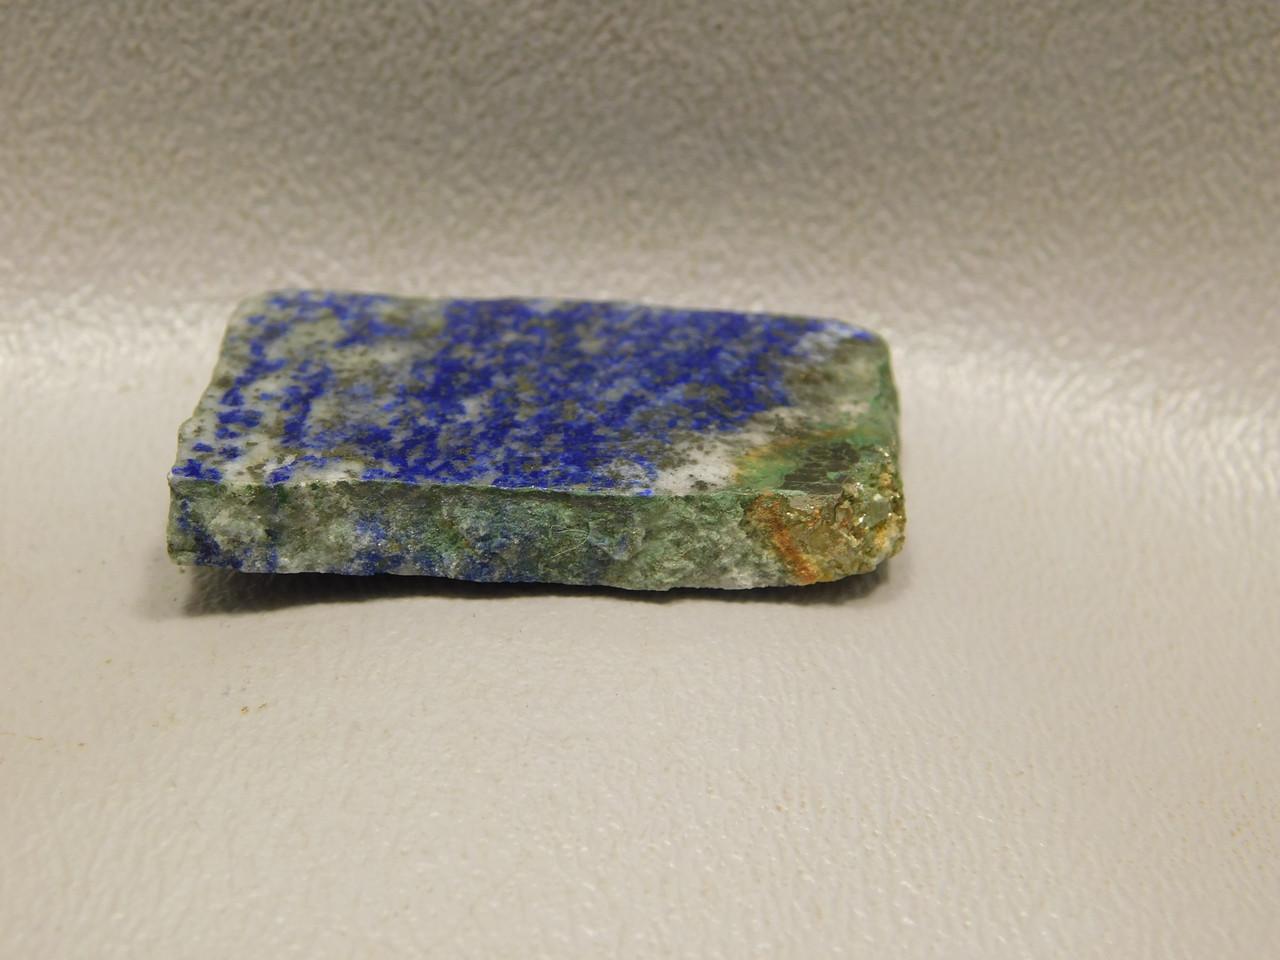 Blue and White Lapis Natural Freeform Slab Cabochon #S11